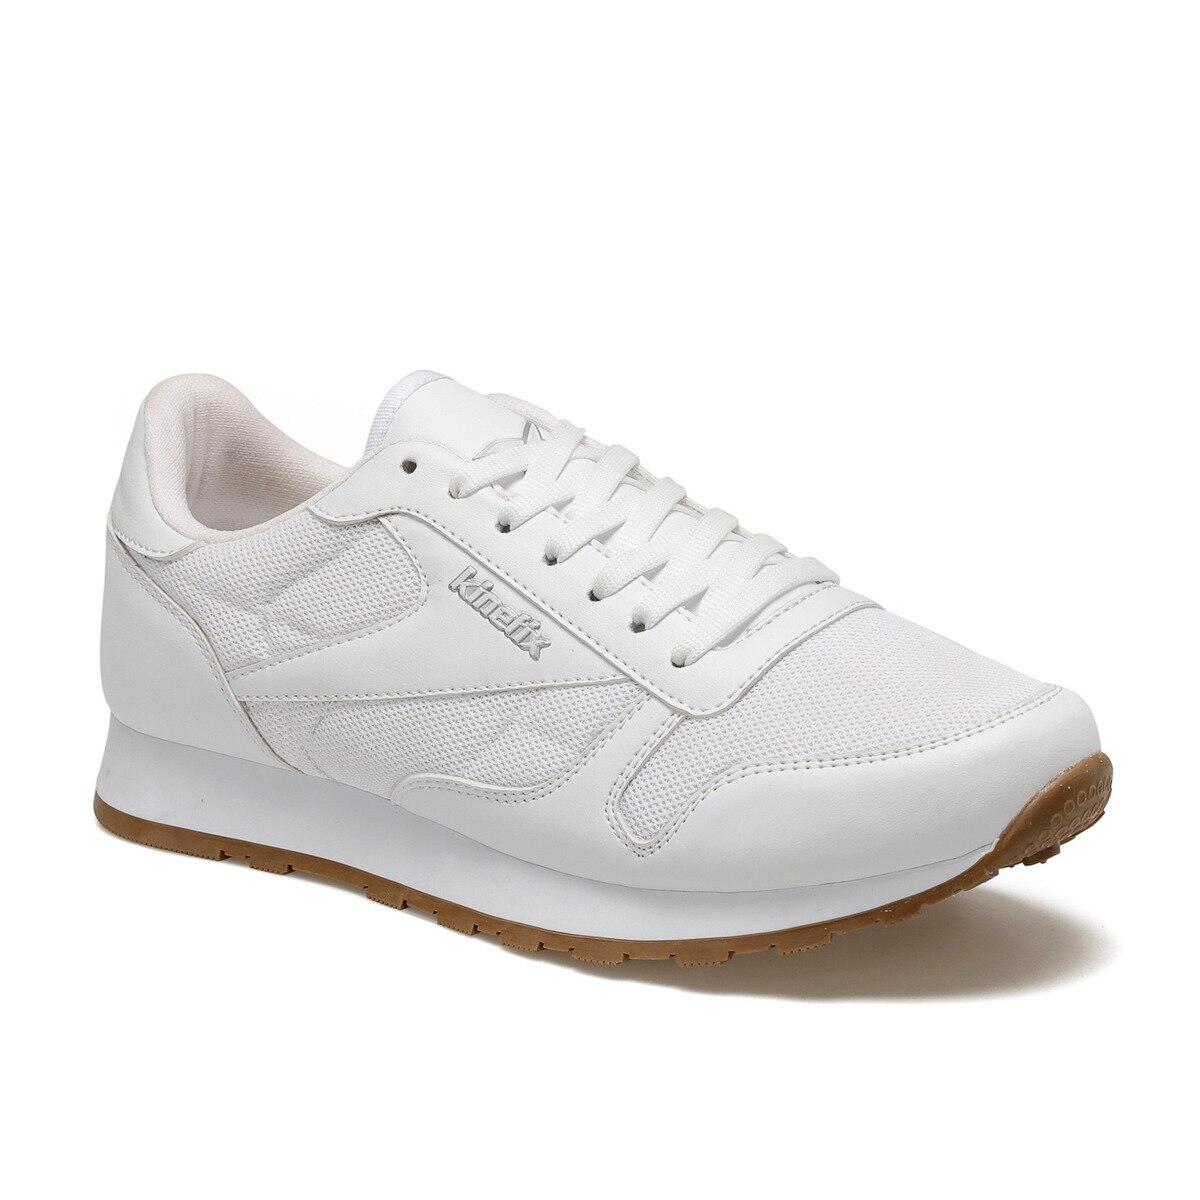 FLO LOWER TX M White Men 'S Sneaker Shoes KINETIX